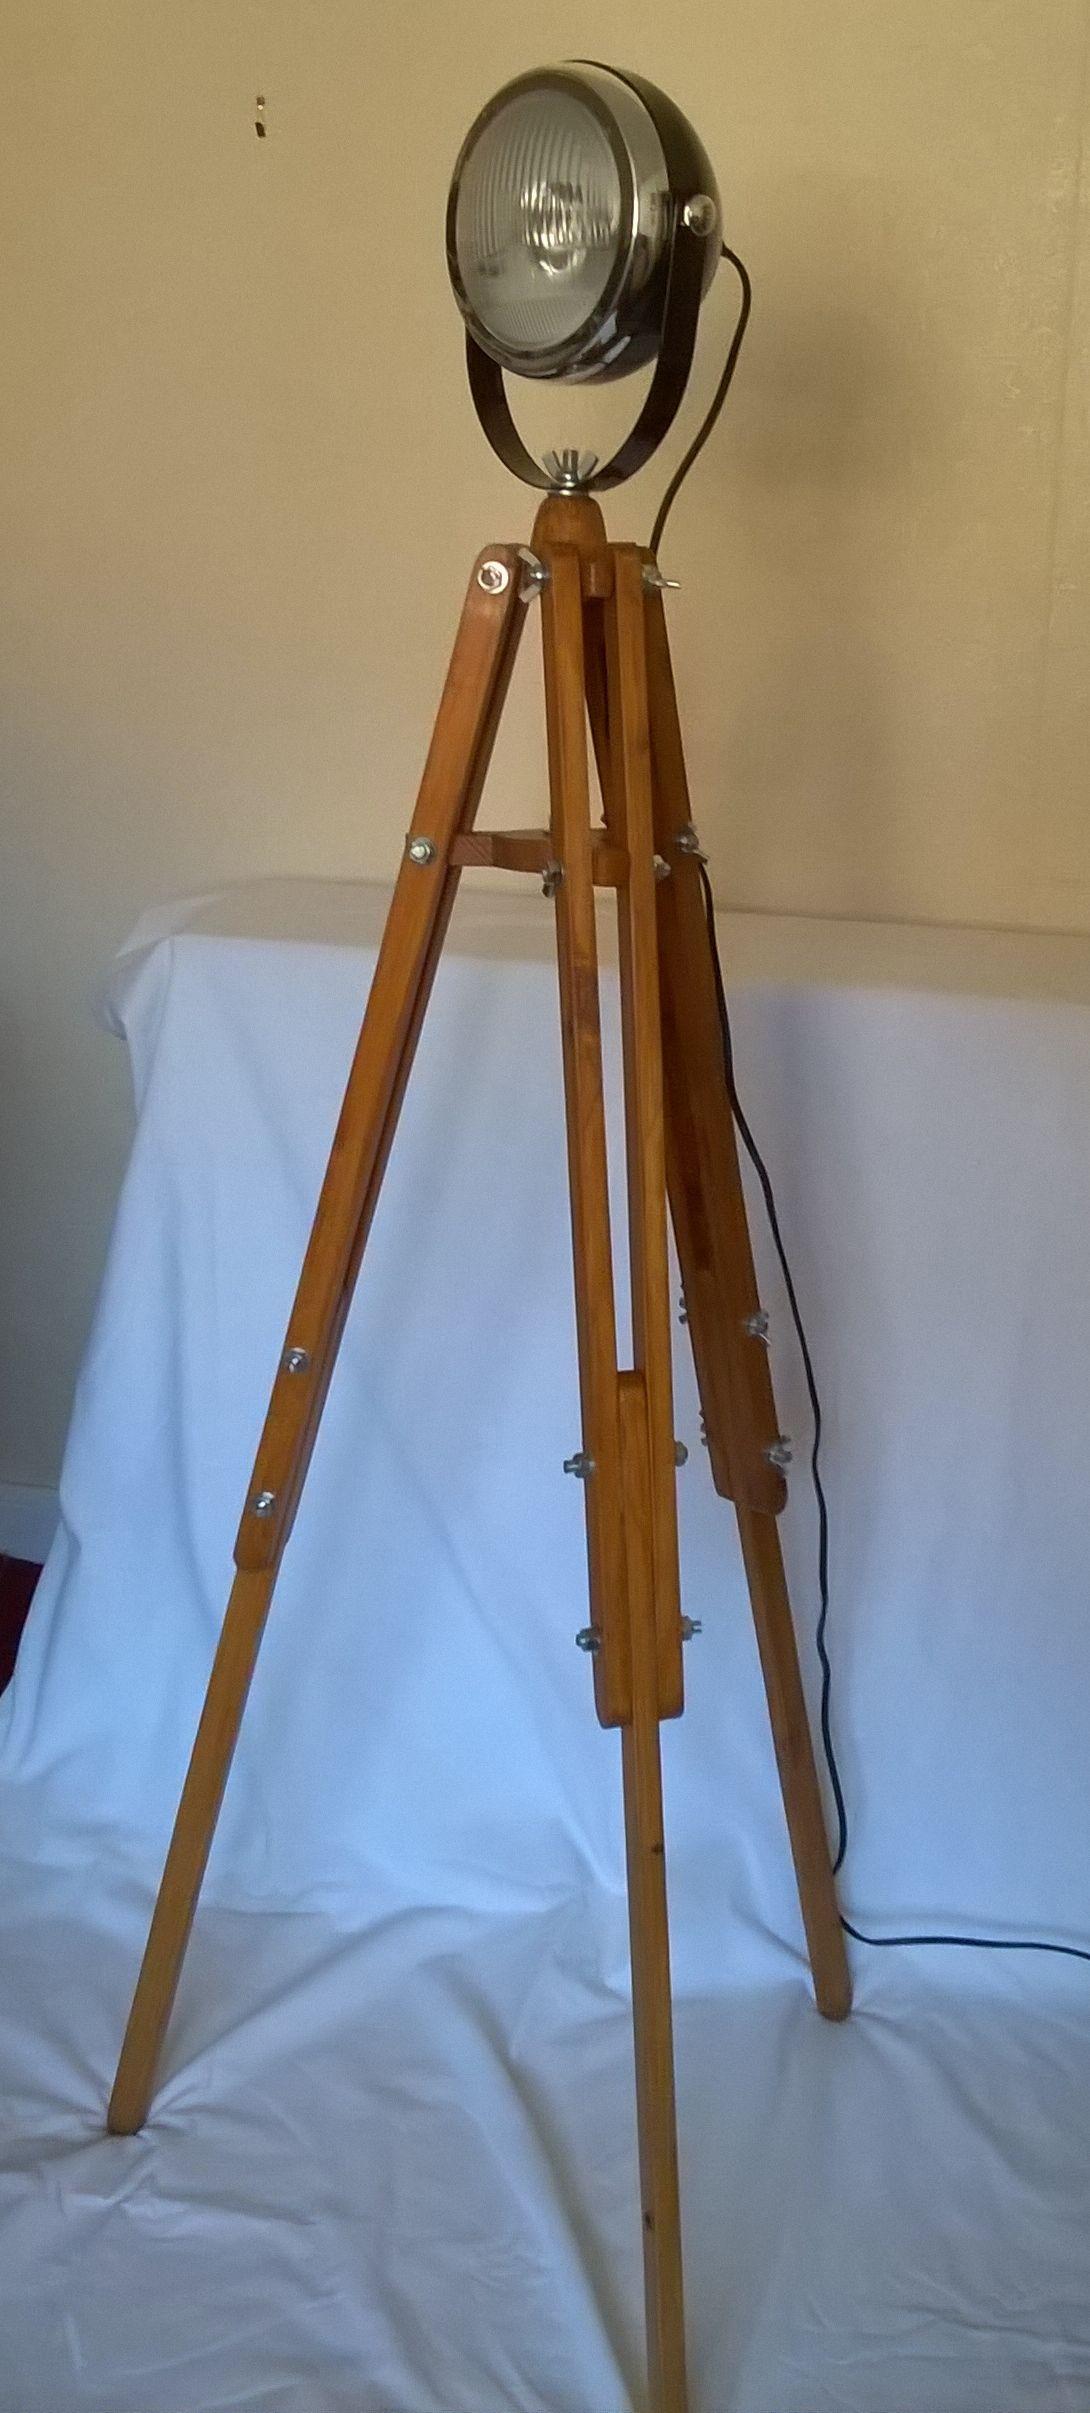 pallet wood tripod with vintage style headlight lamp. Black Bedroom Furniture Sets. Home Design Ideas